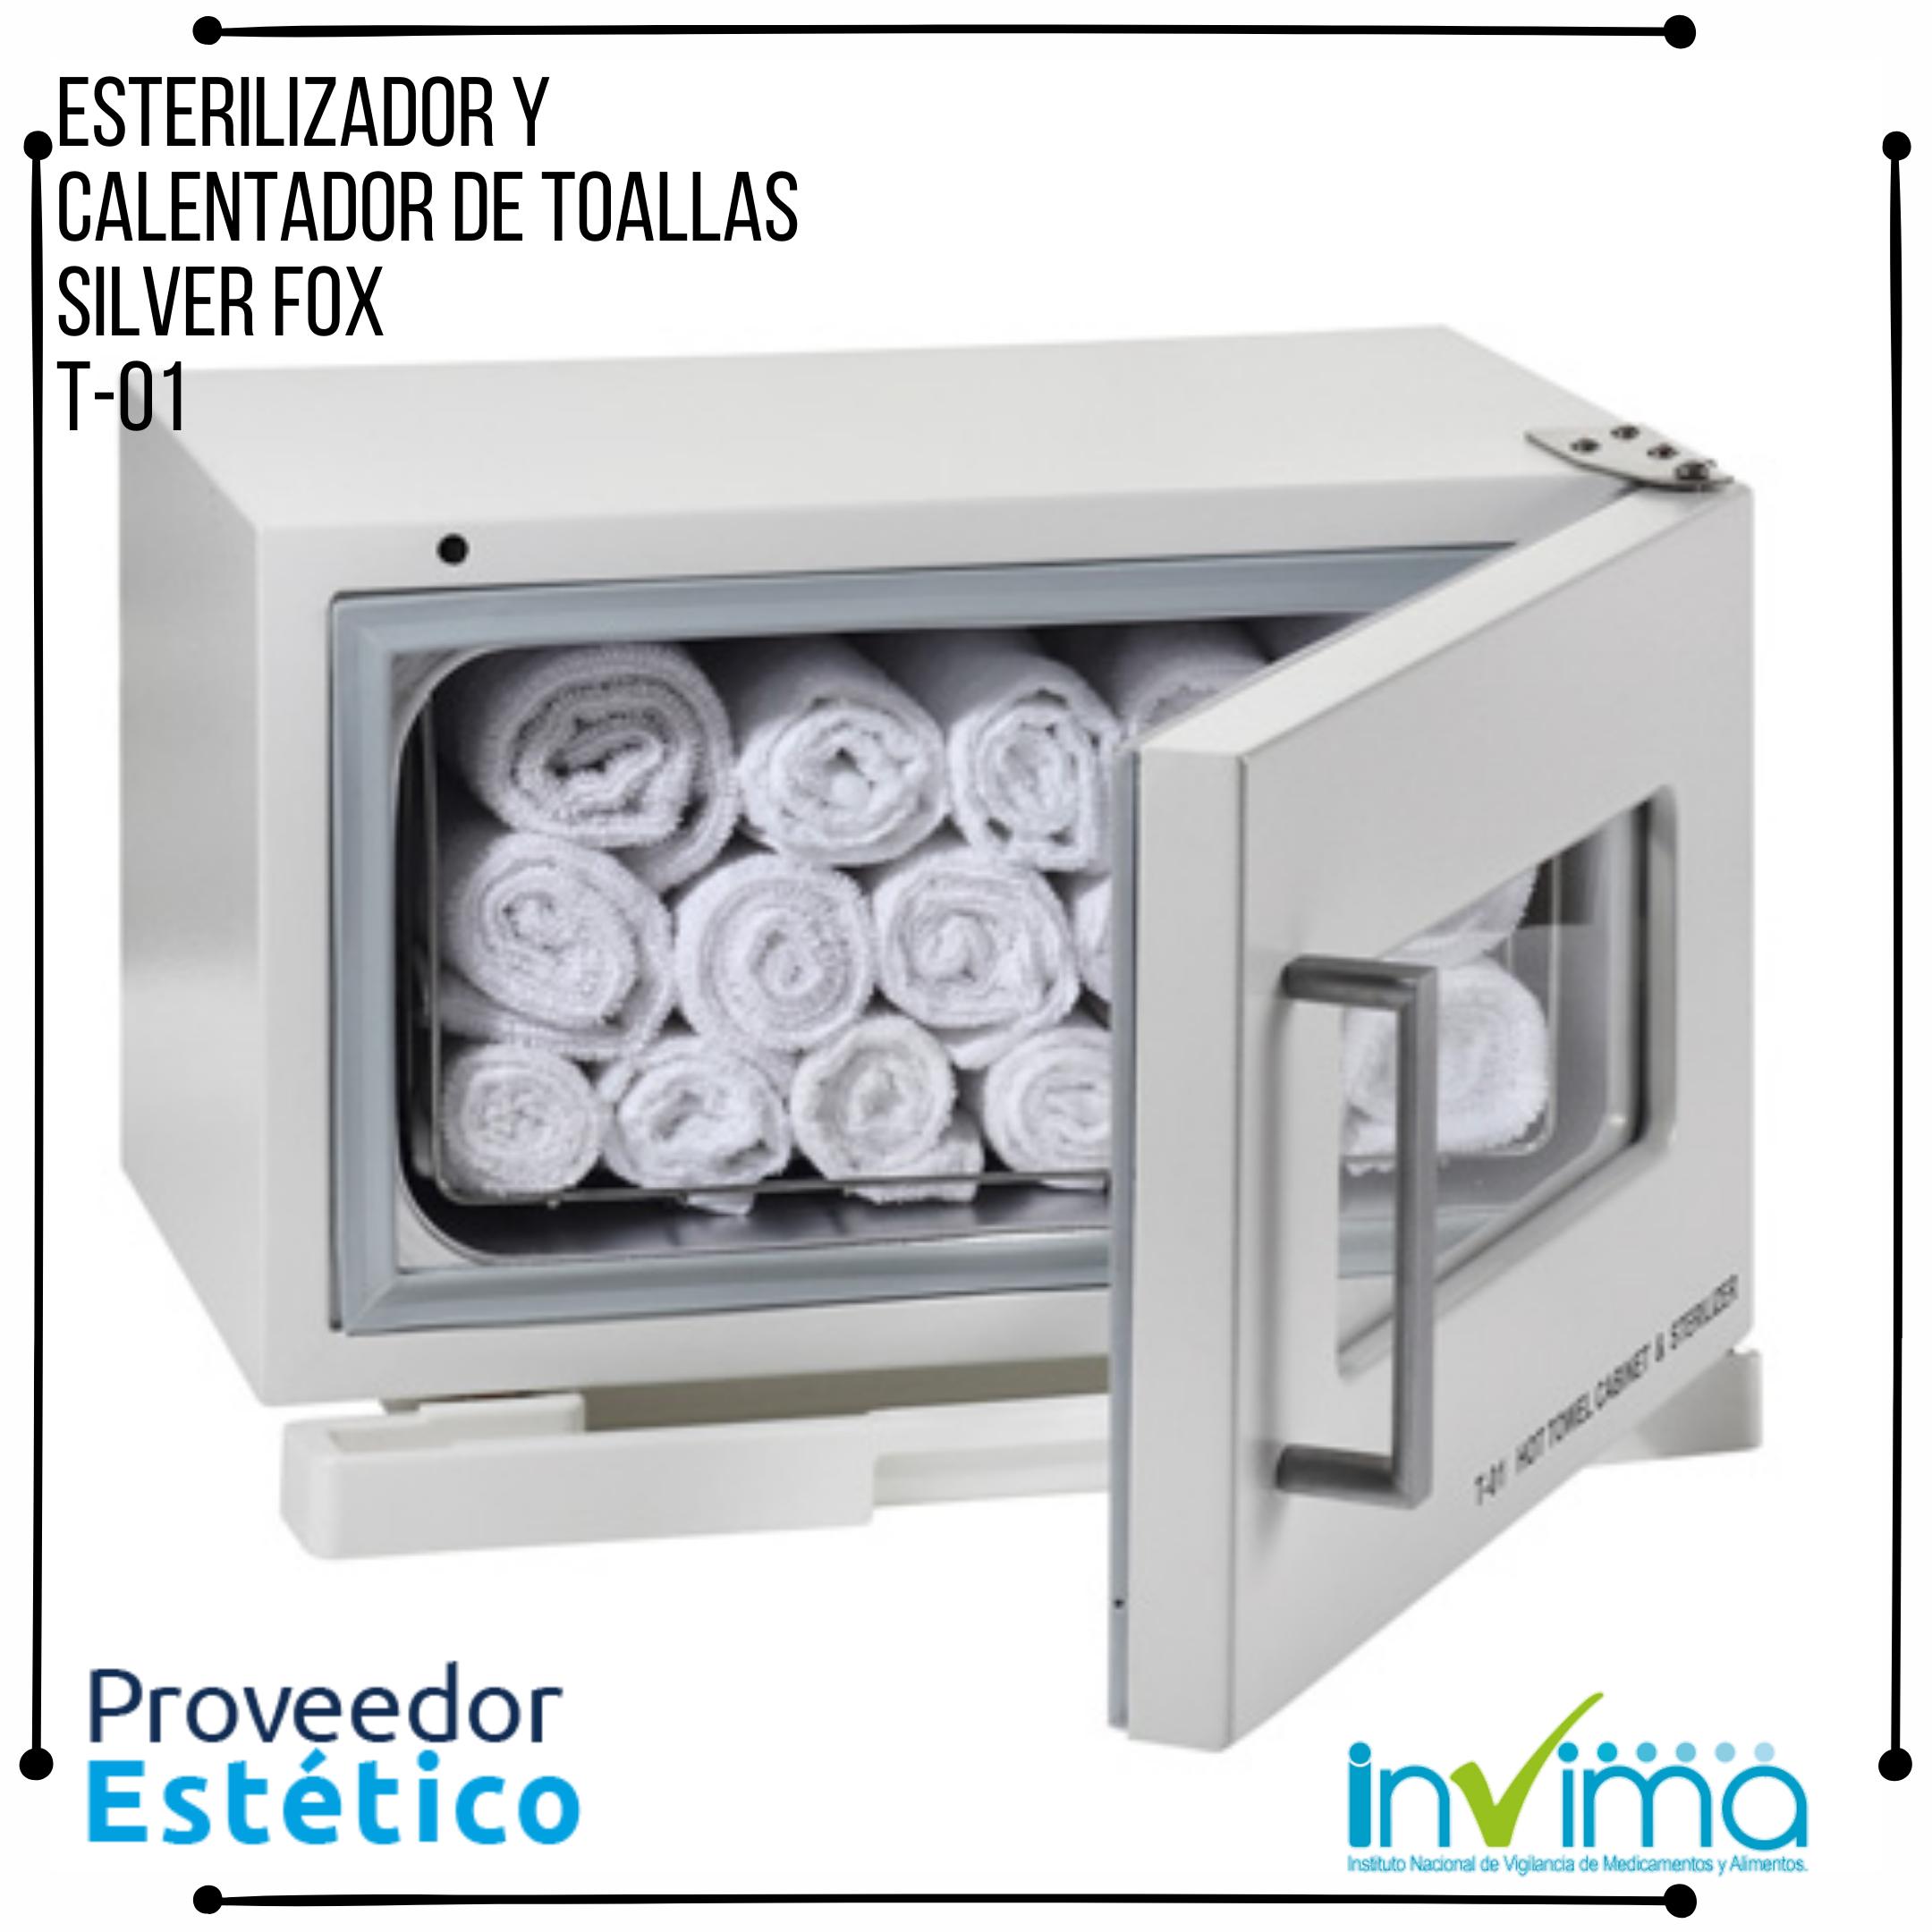 https://0201.nccdn.net/1_2/000/000/0a7/1fb/esterilizador-y-calentador-de-toallas-silver-fox-t-01--1-.png